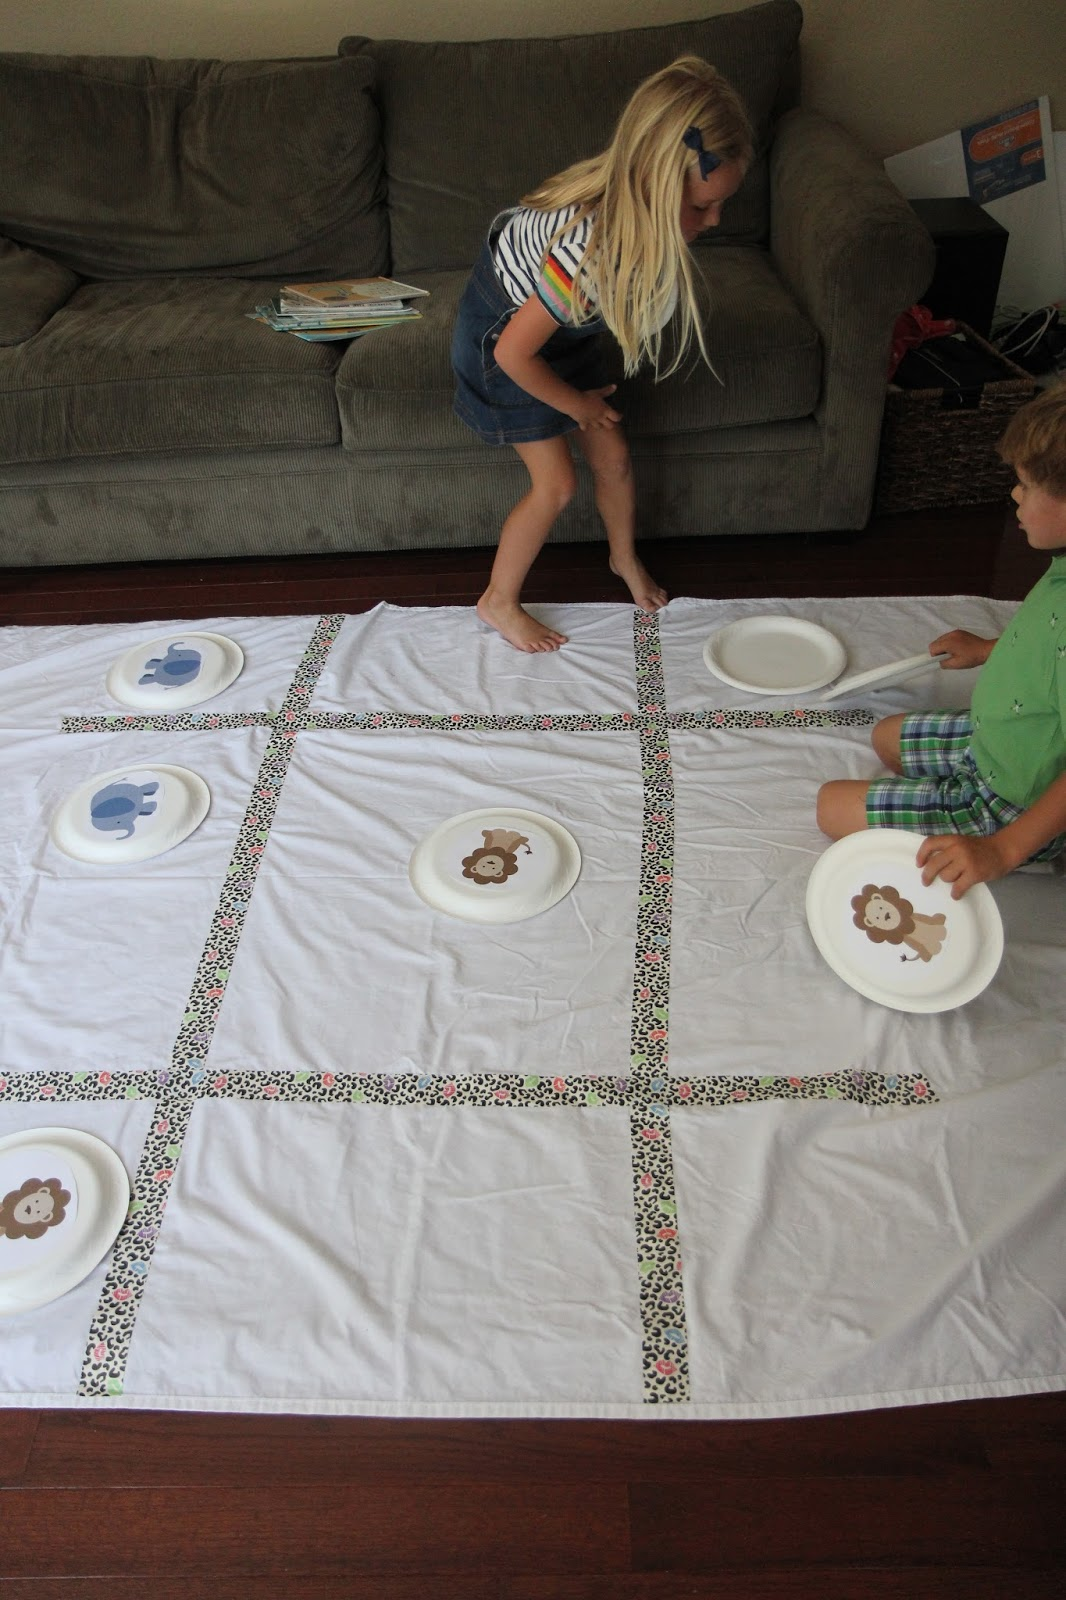 zoo animal toddlers activities toddler preschoolers toe game